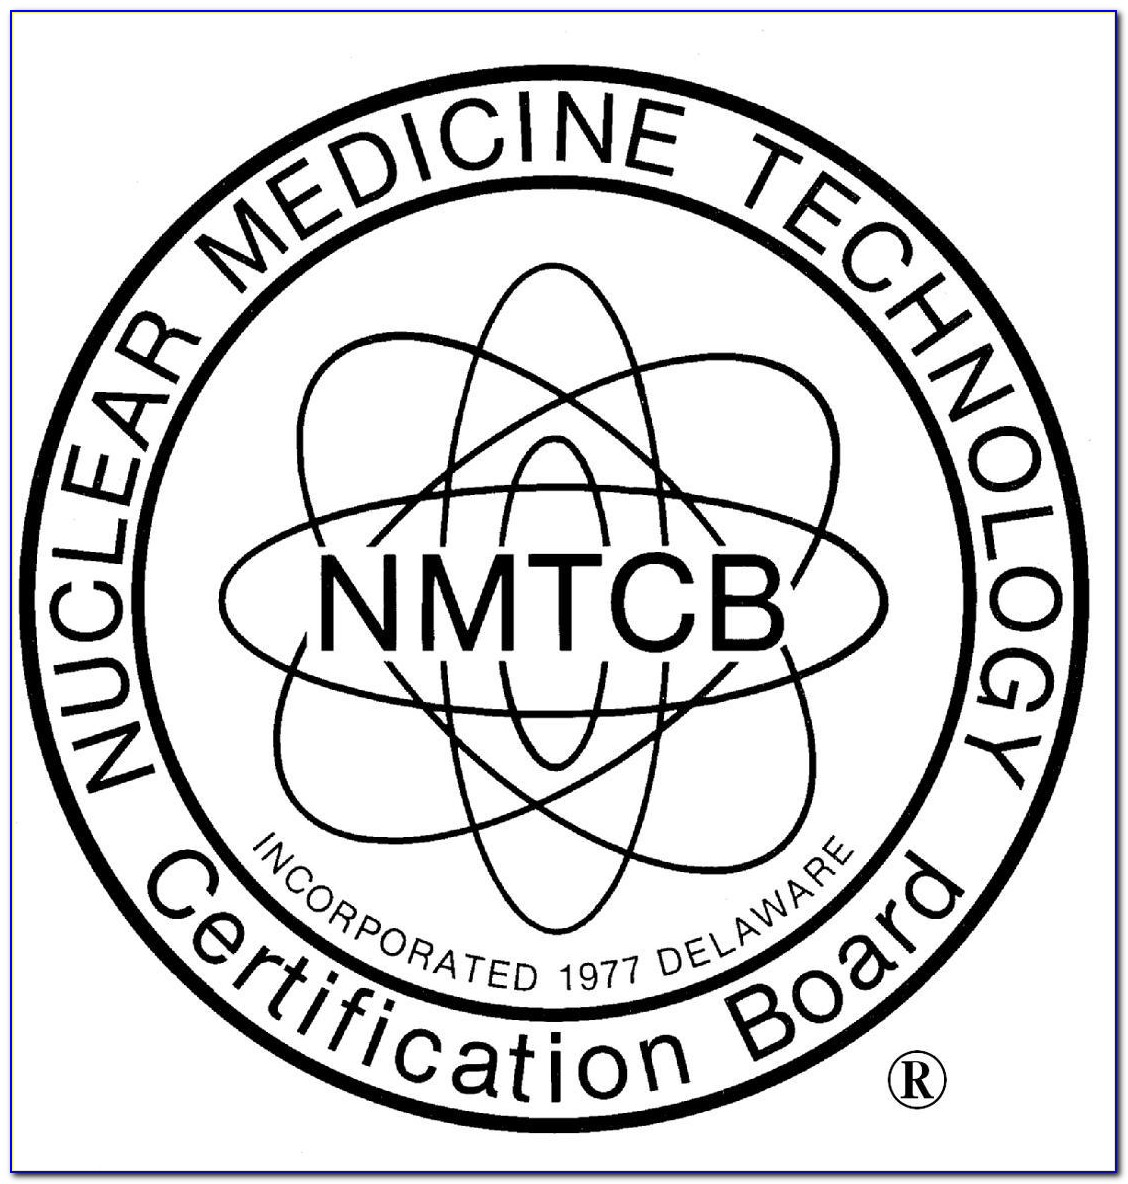 Nuclear Medicine Technologist Certification Board